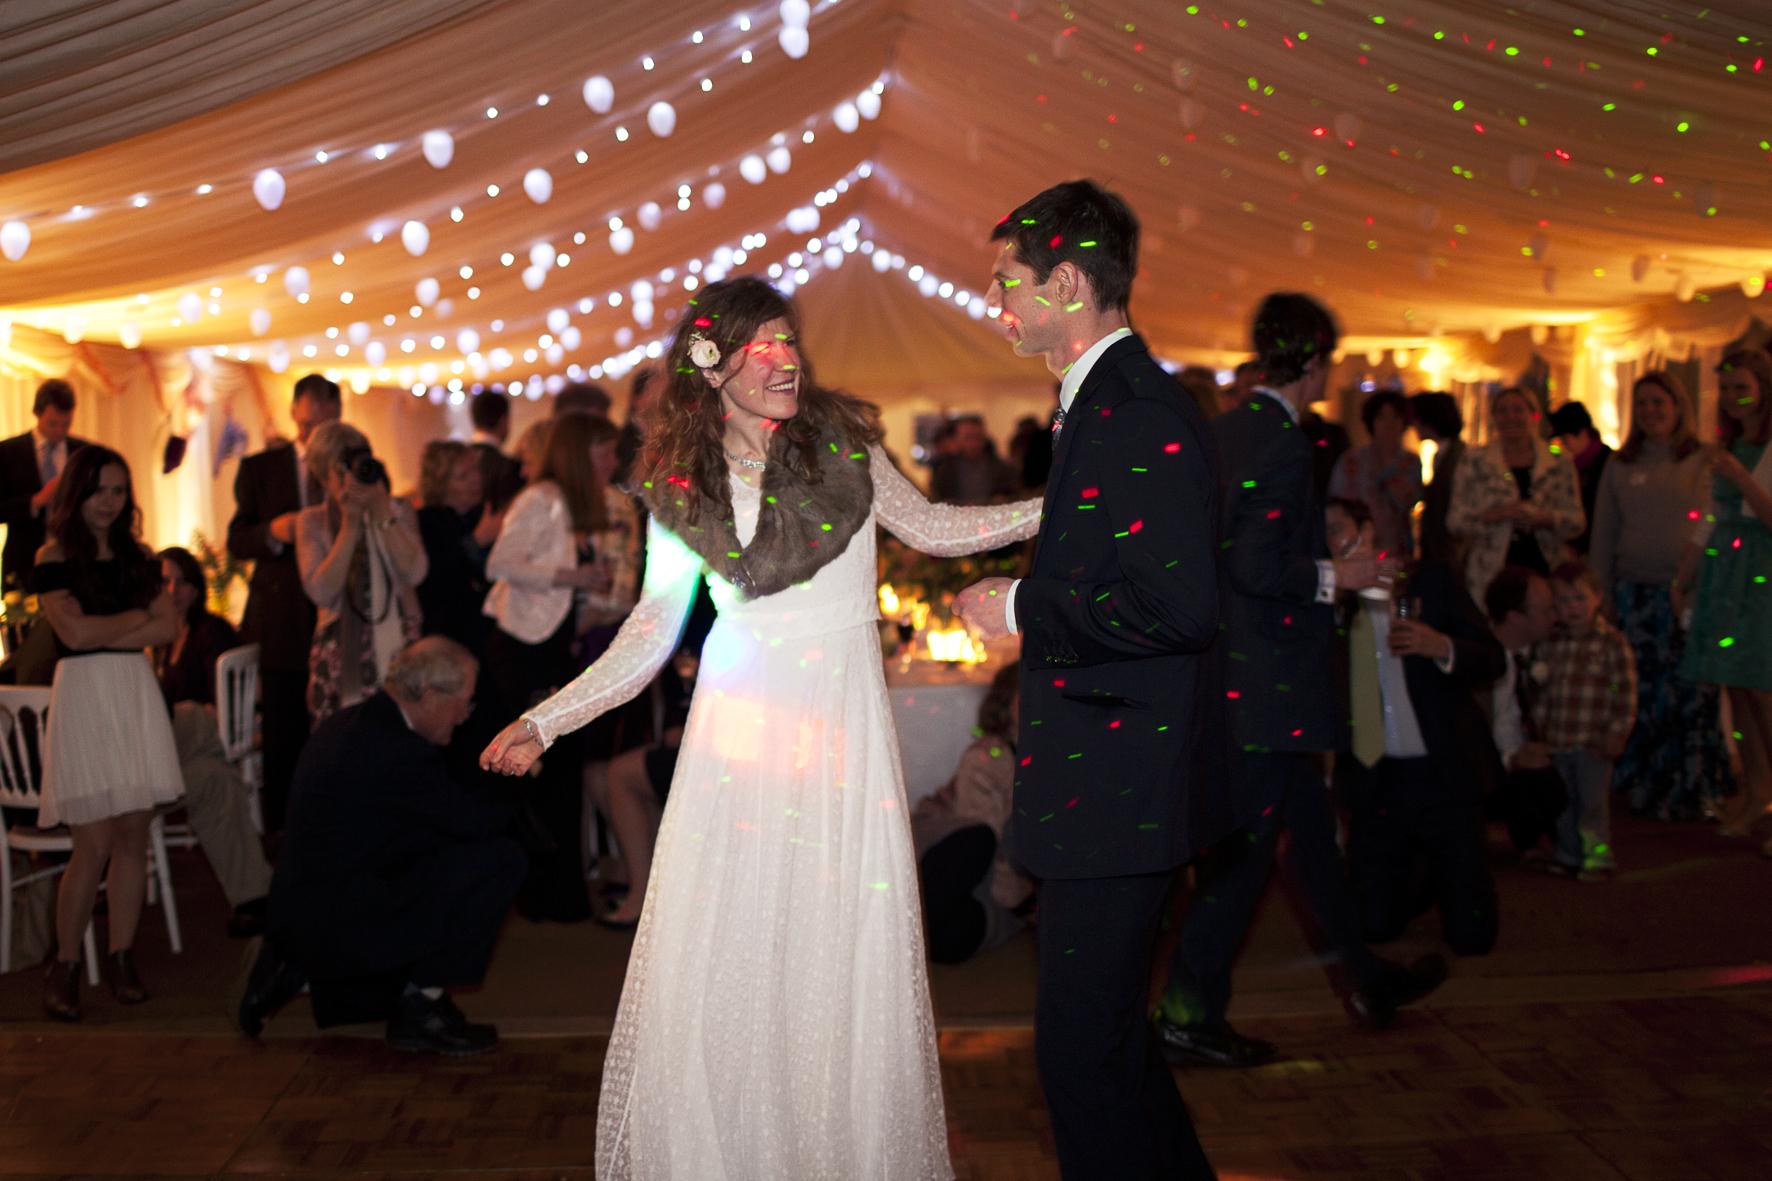 Wedding example_M&P__MG_4401-Edit_Claudia Leisinger.jpg